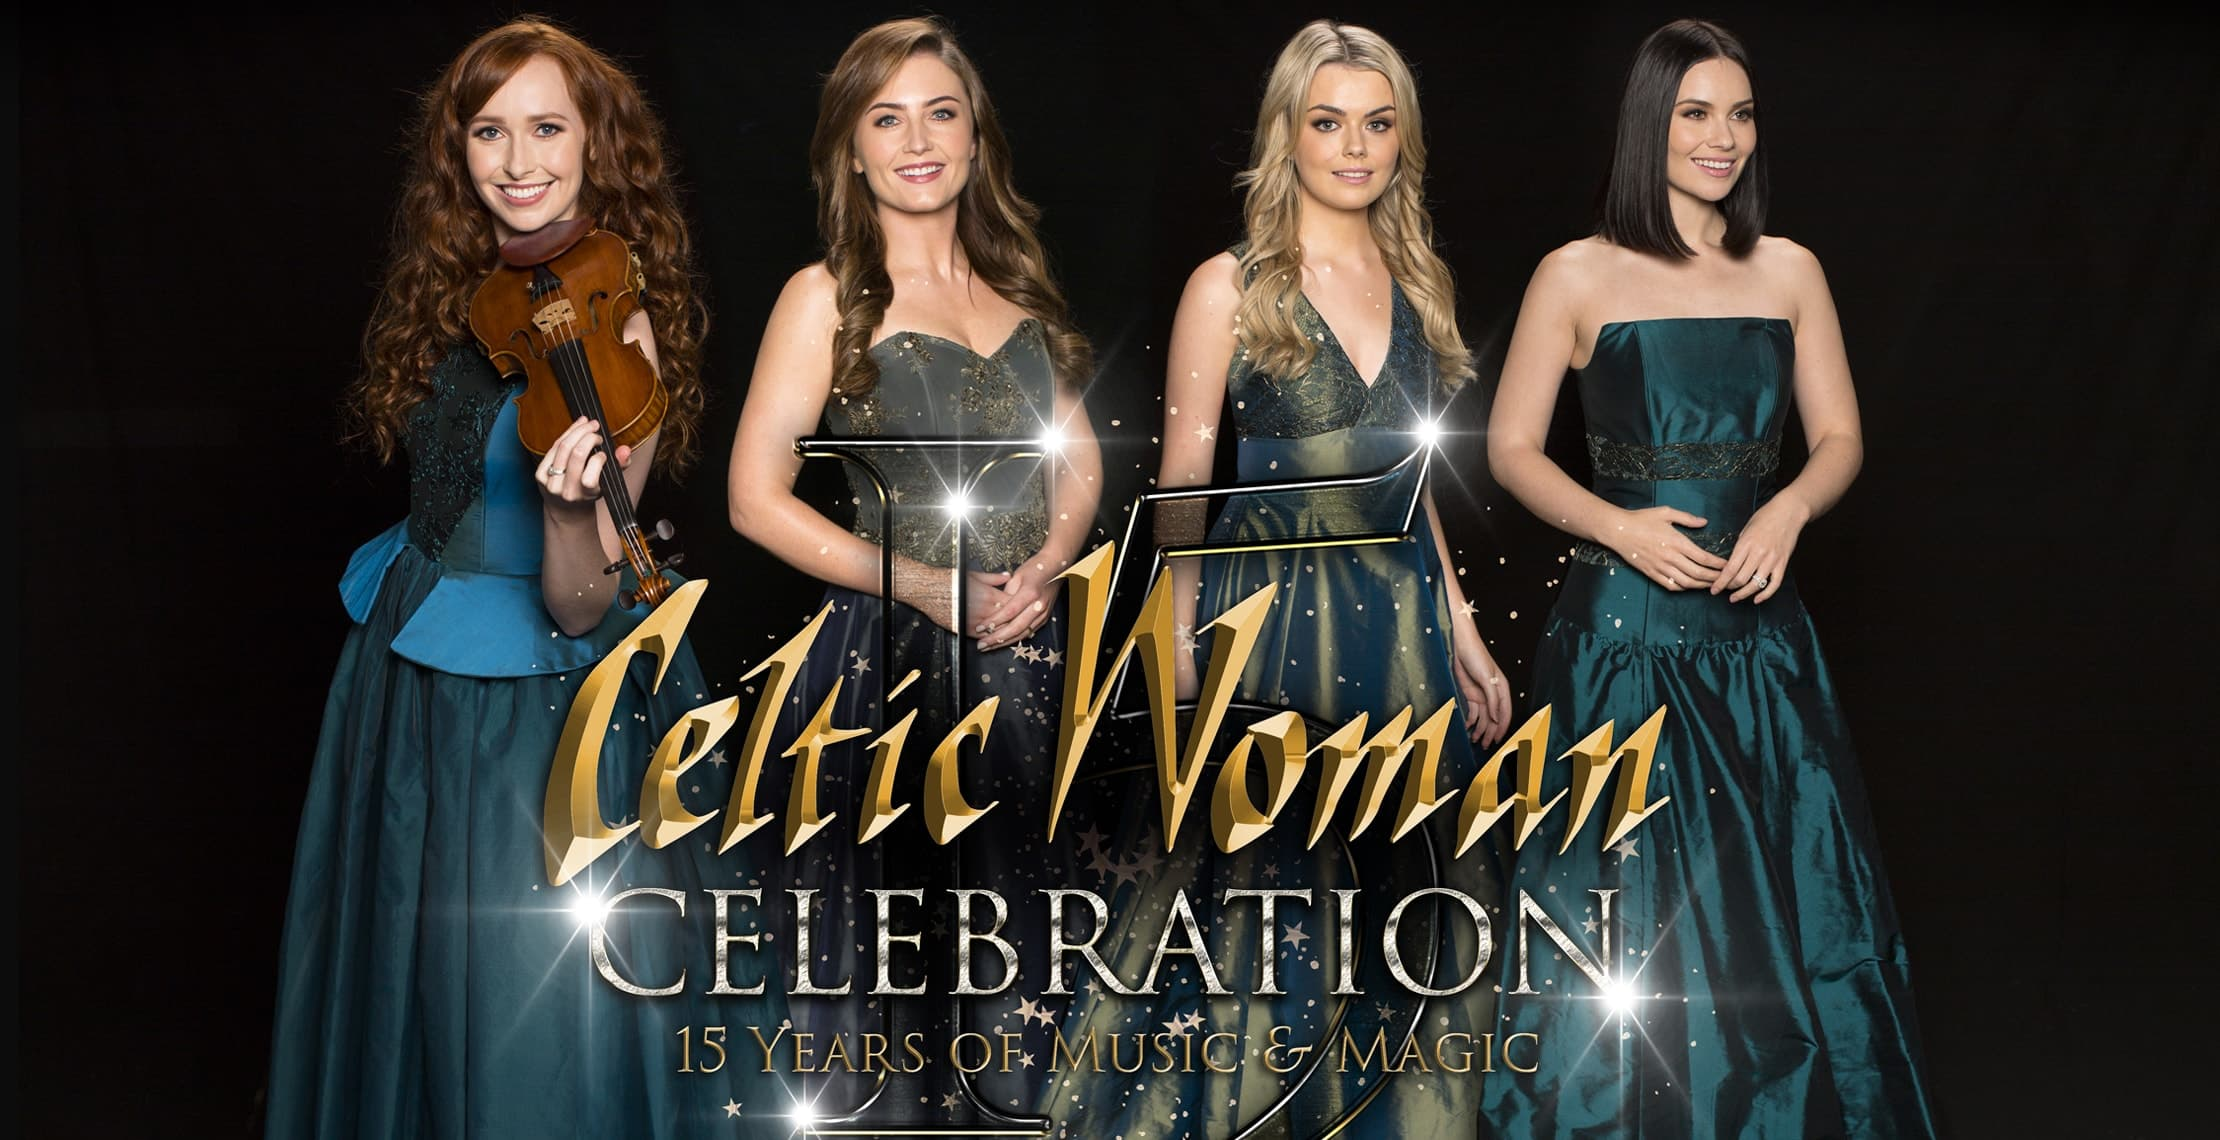 Celtic Woman: Celebration